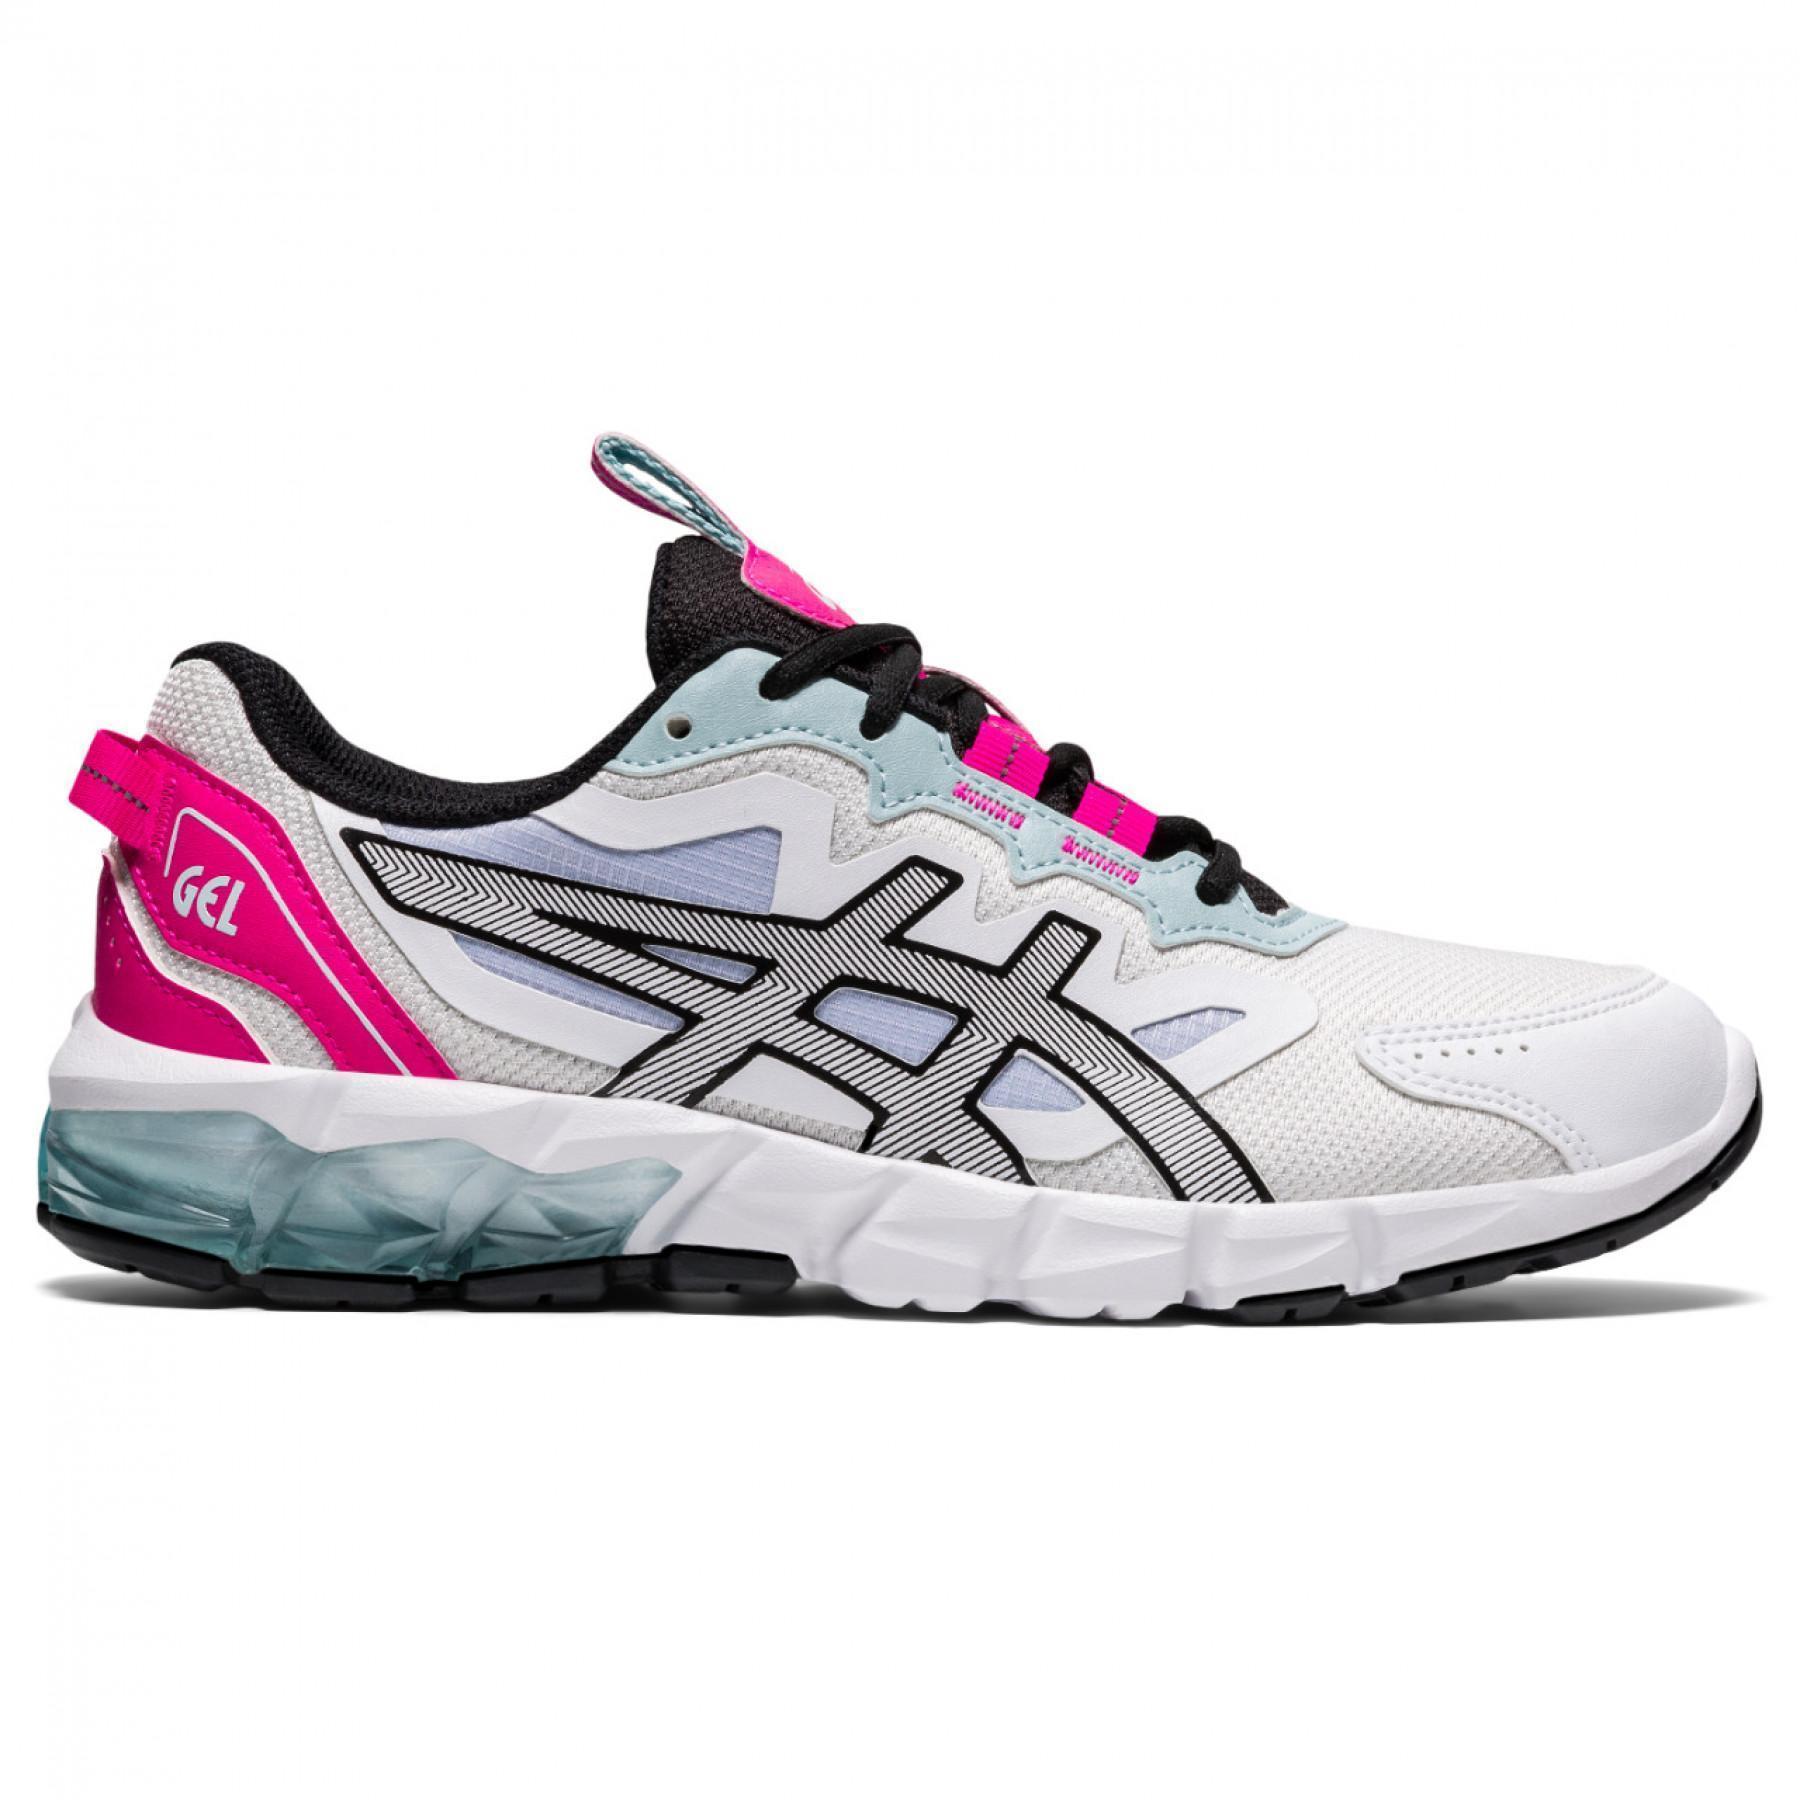 Asics Gel-Quantum 90 Women's Shoes